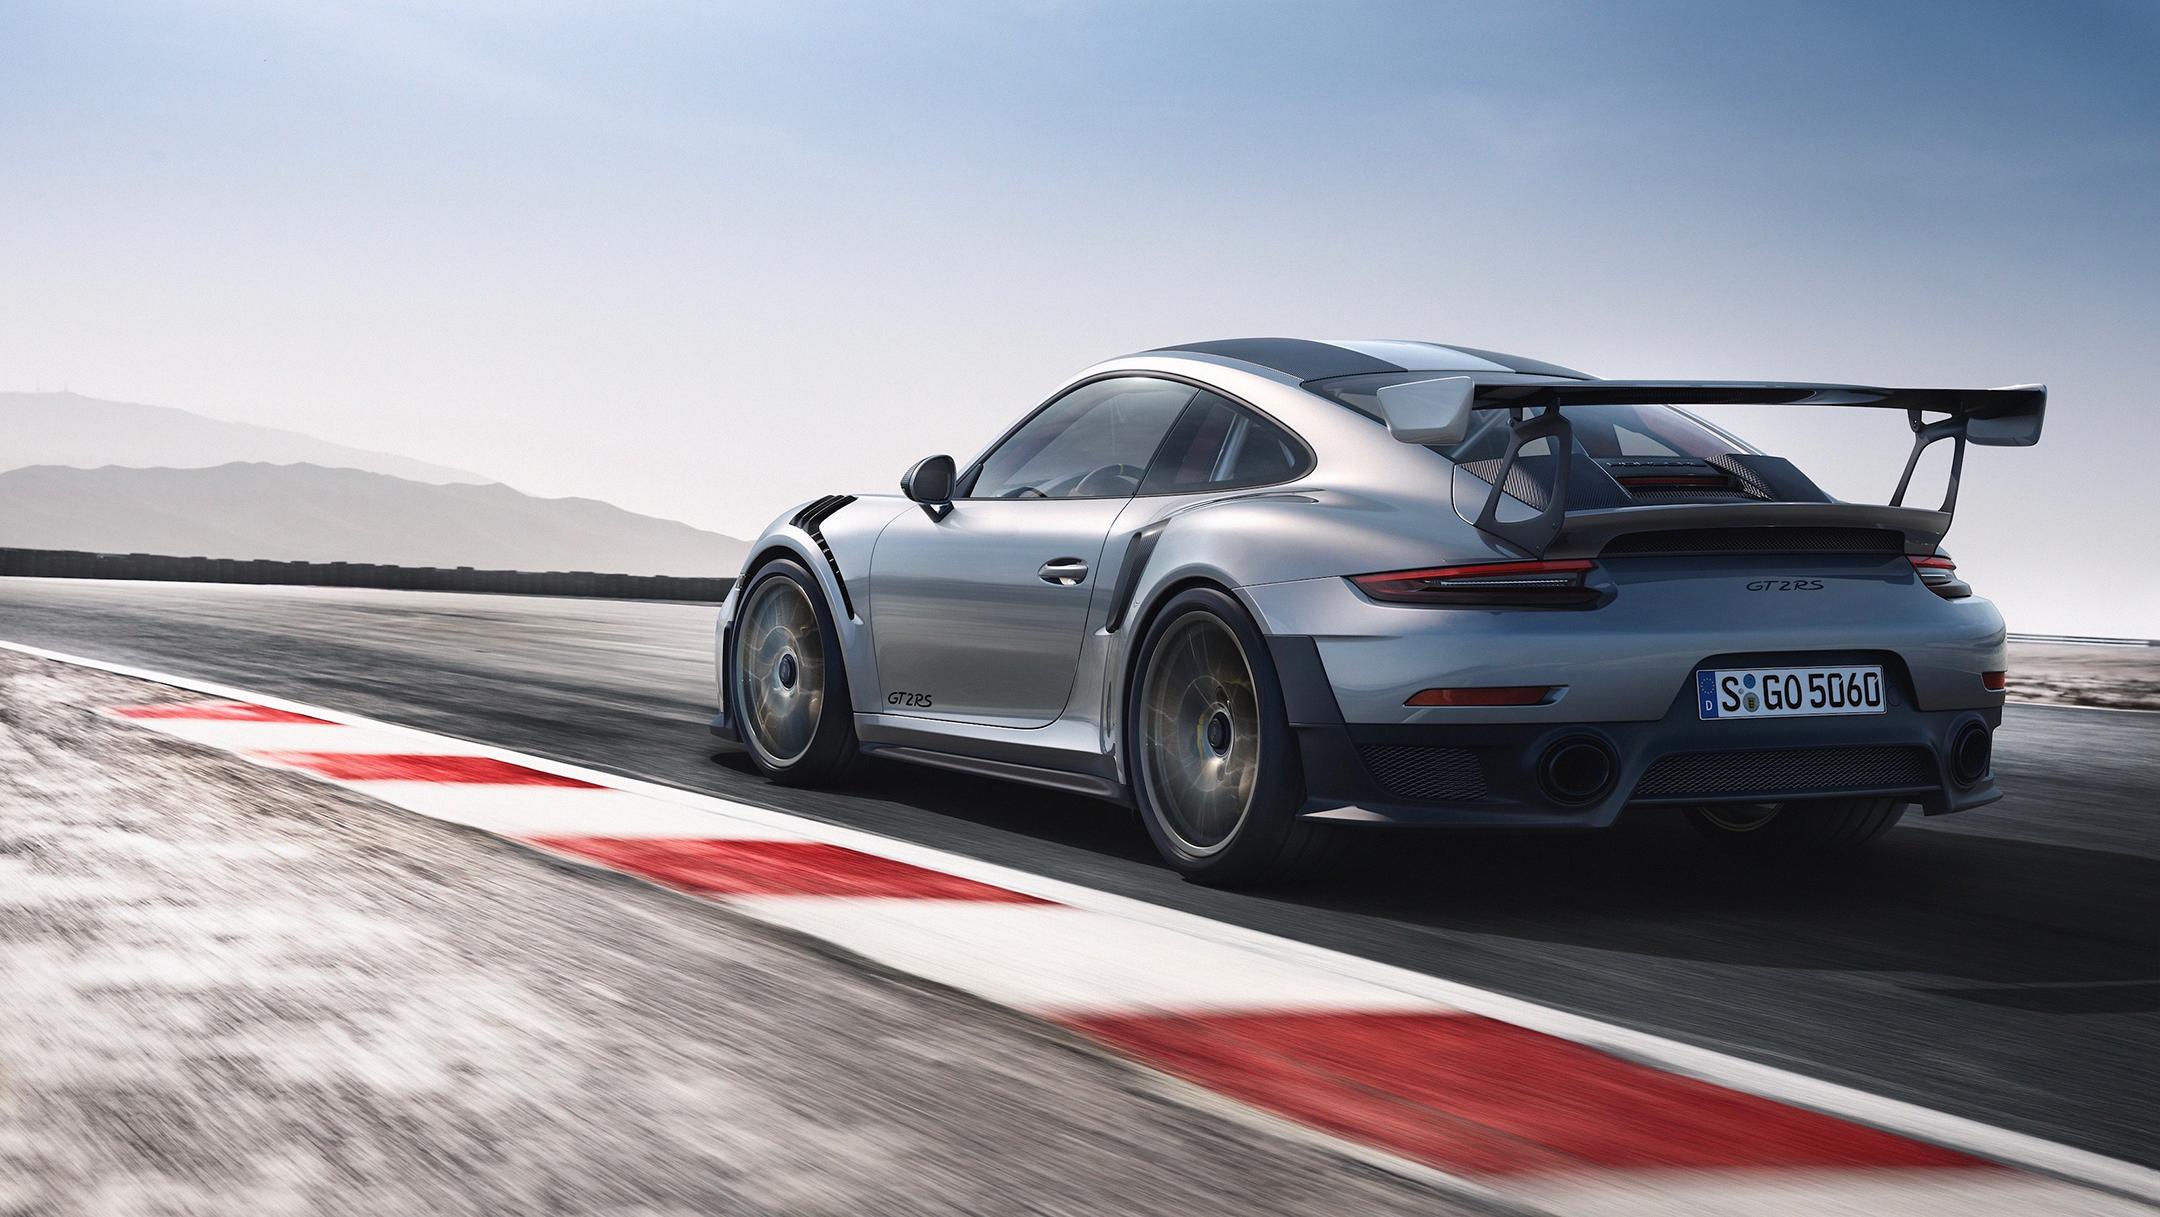 Porsche 911 GT2 RS - 2017 - rear track